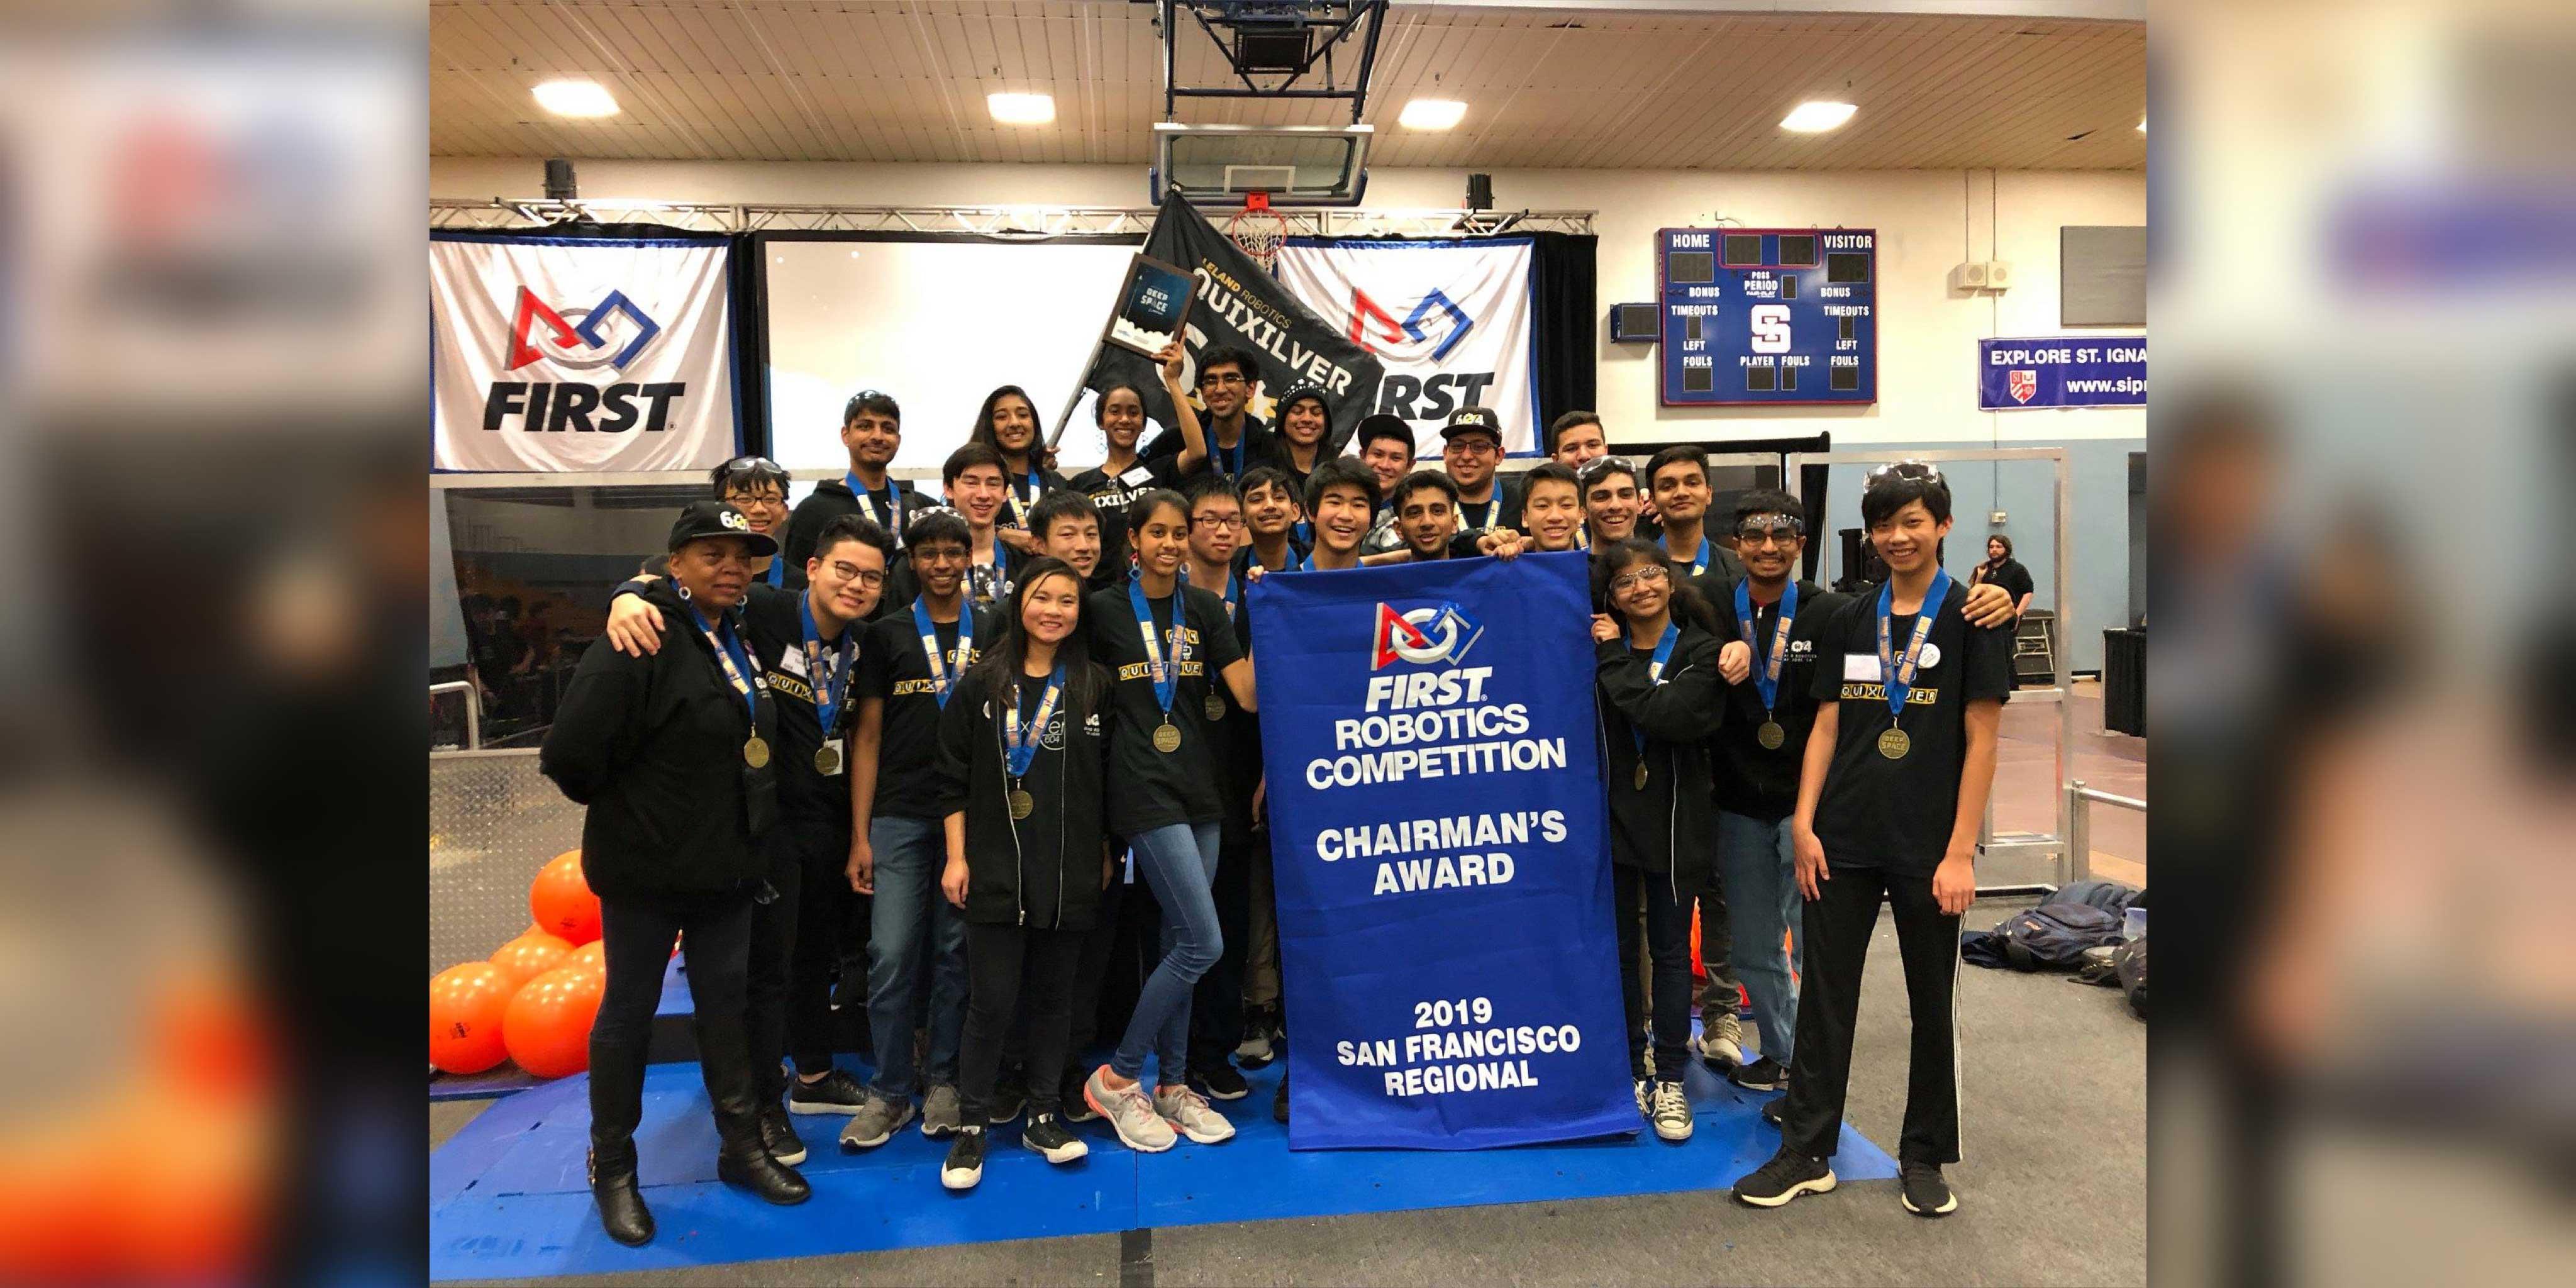 San Francisco FIRST Robotics Regional – 2019